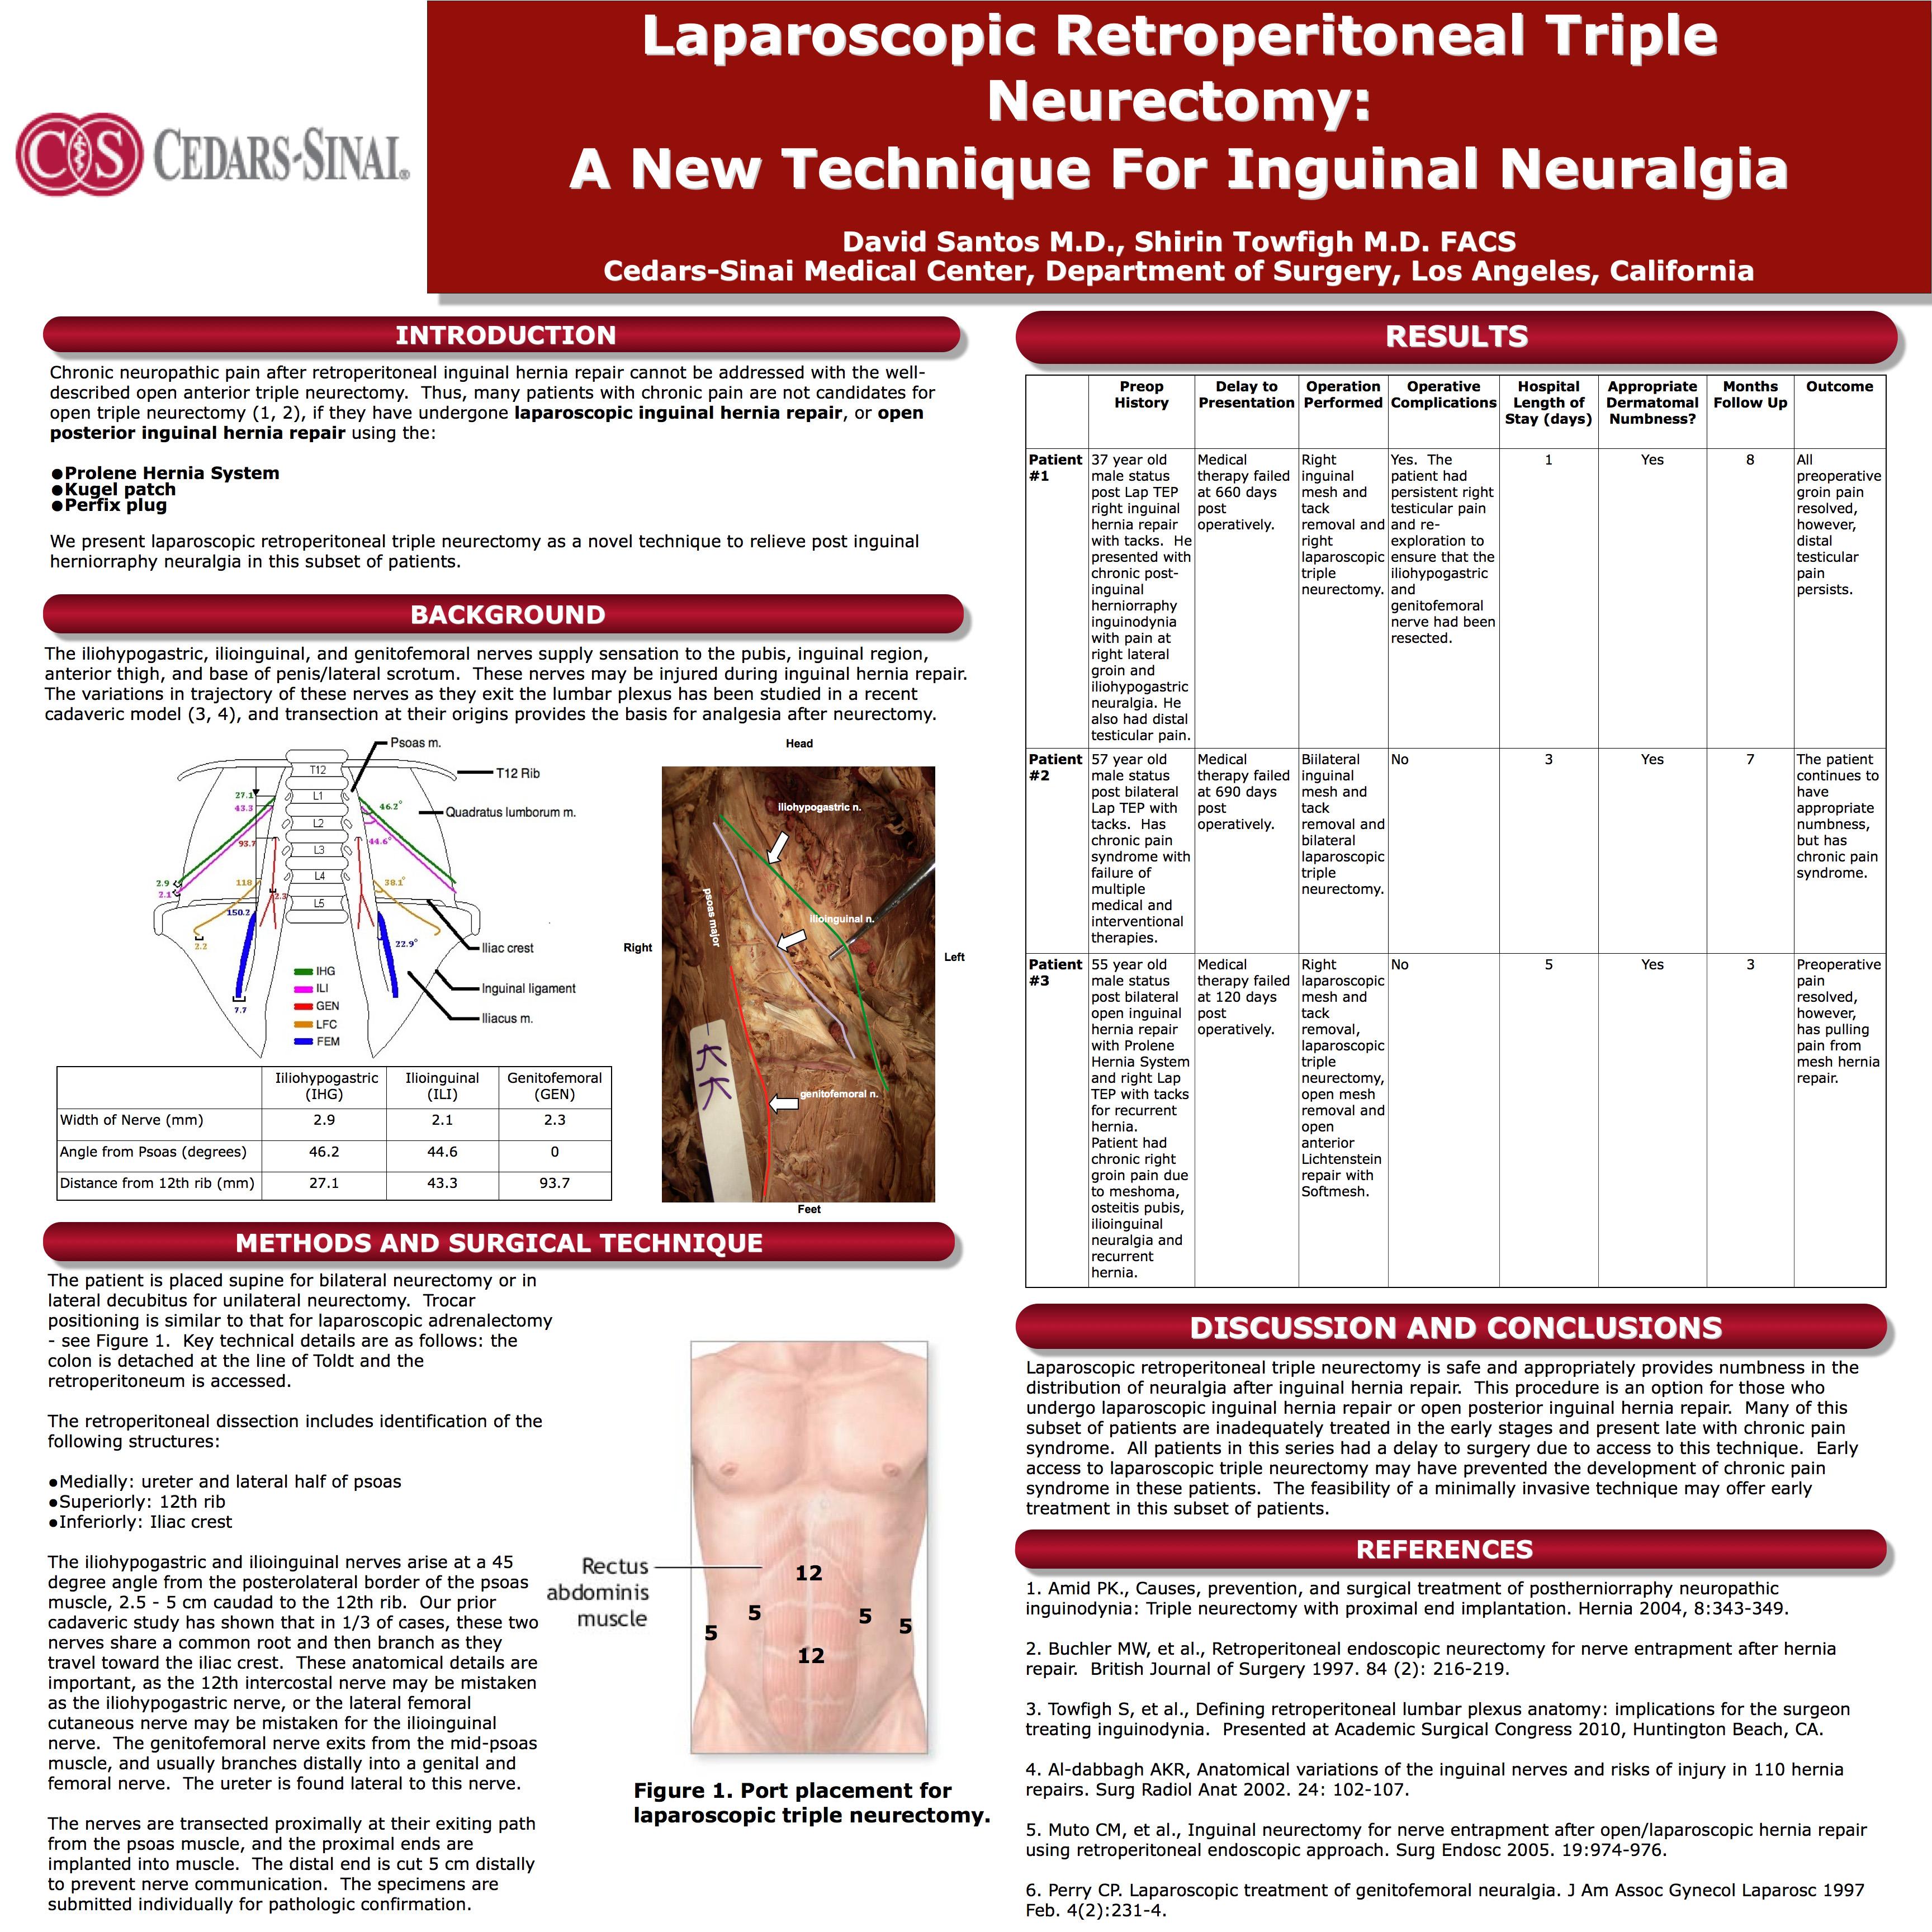 Laparoscopic Retroperitoneal Triple Neurectomy: A New Technique for ...